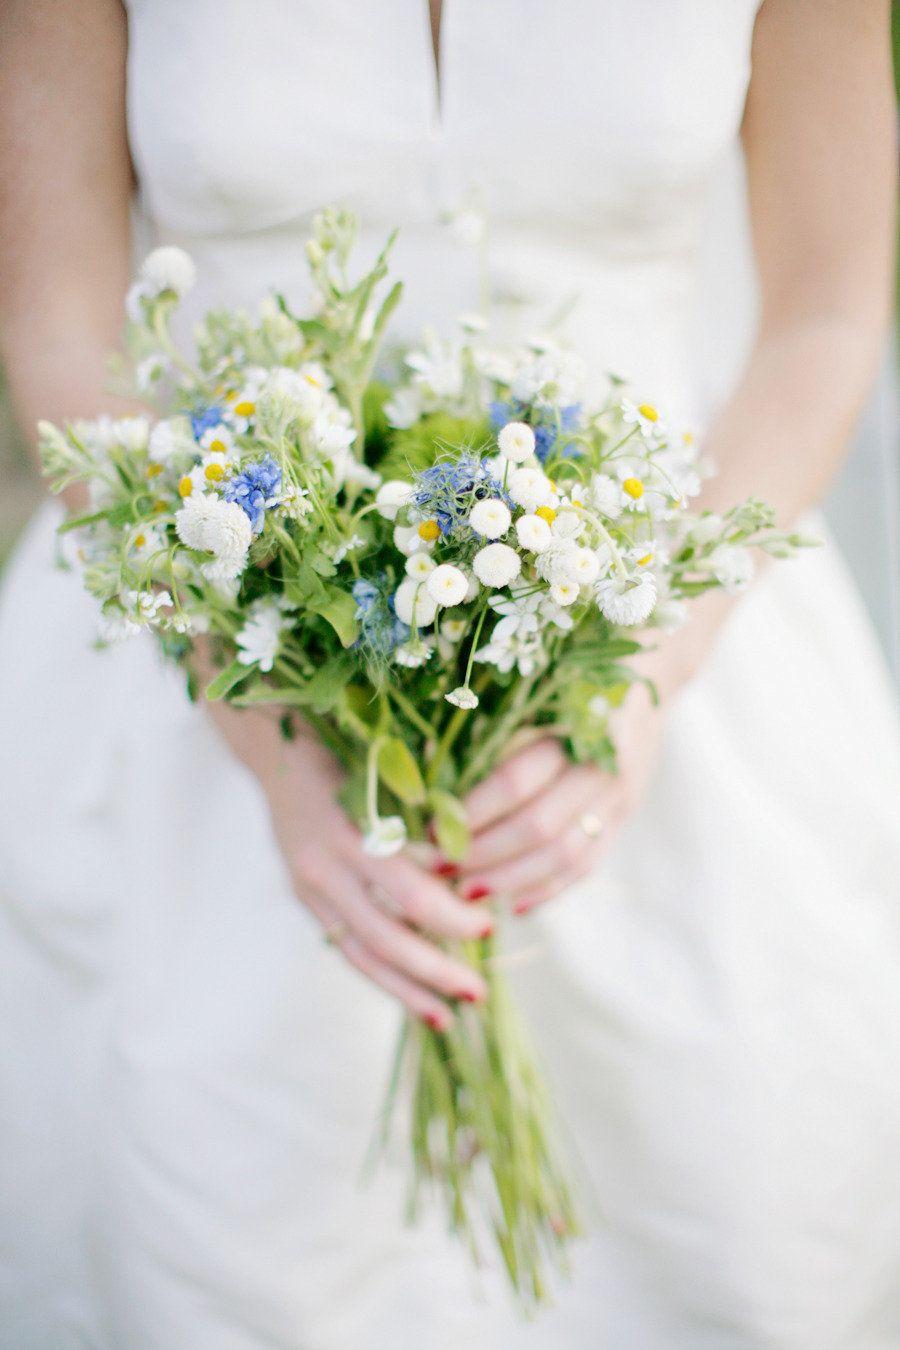 Evergreen Wedding from Alders Photography #fantasticweddingbouquets